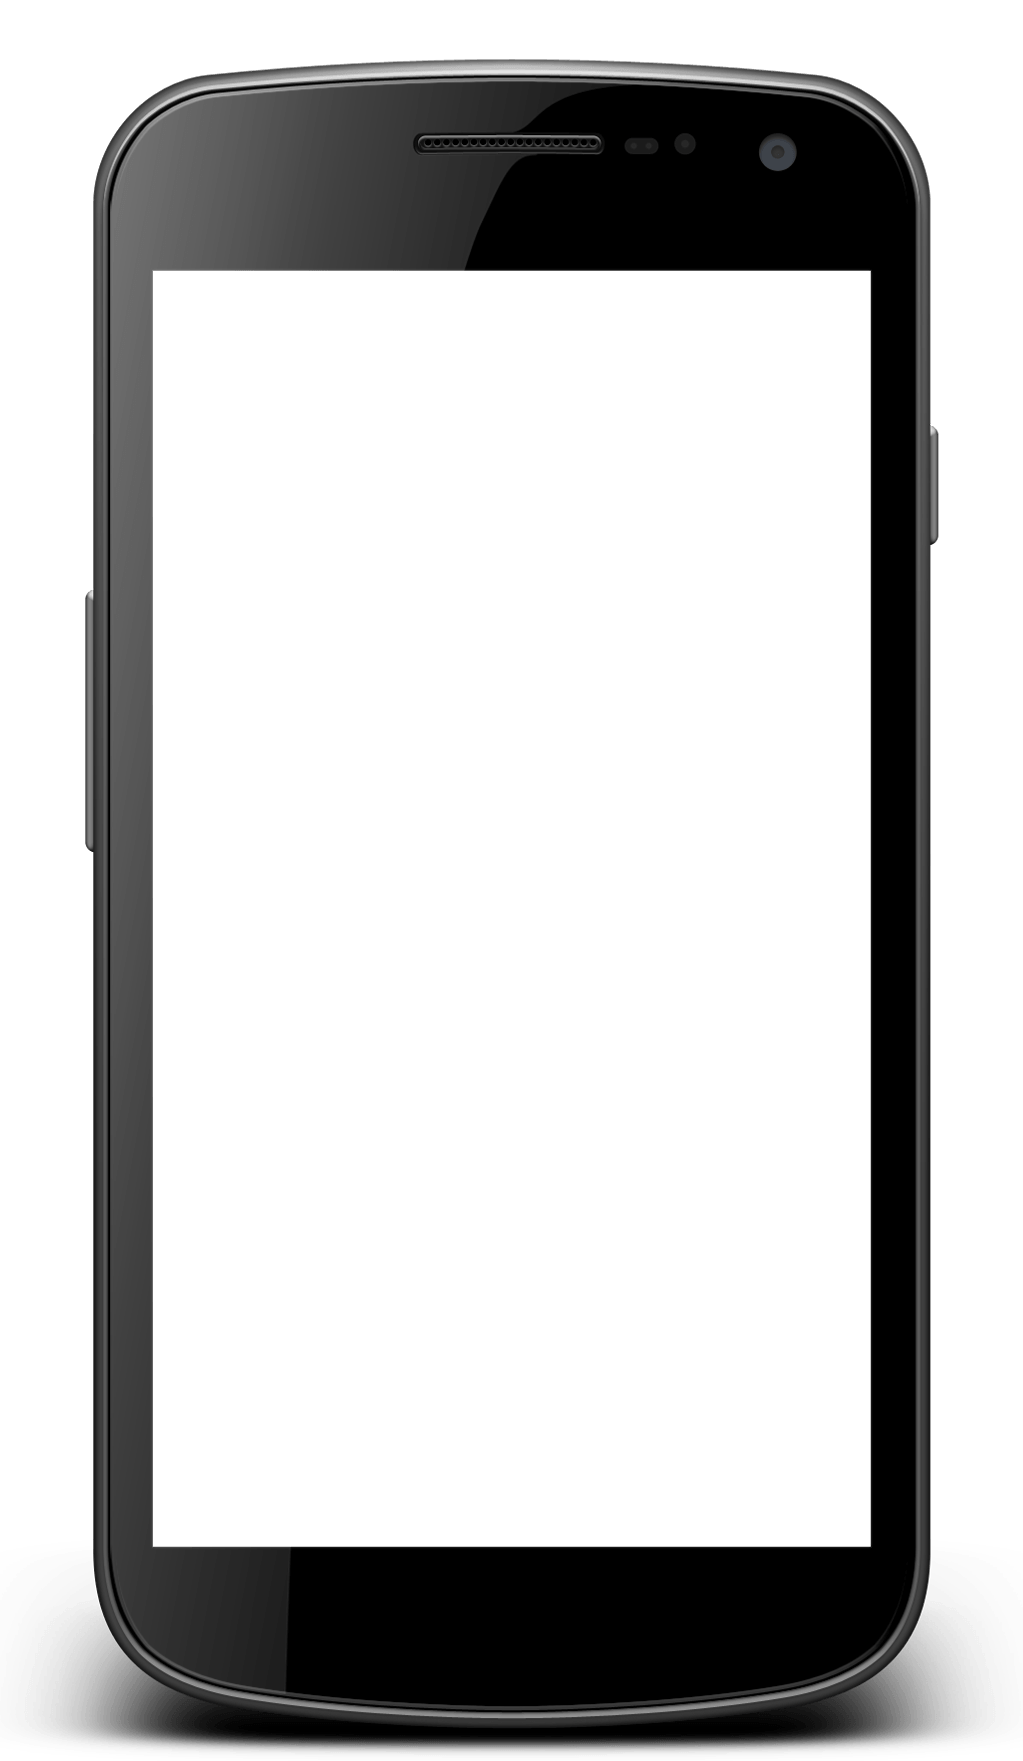 smartphone with transparent screen png image purepng. Black Bedroom Furniture Sets. Home Design Ideas